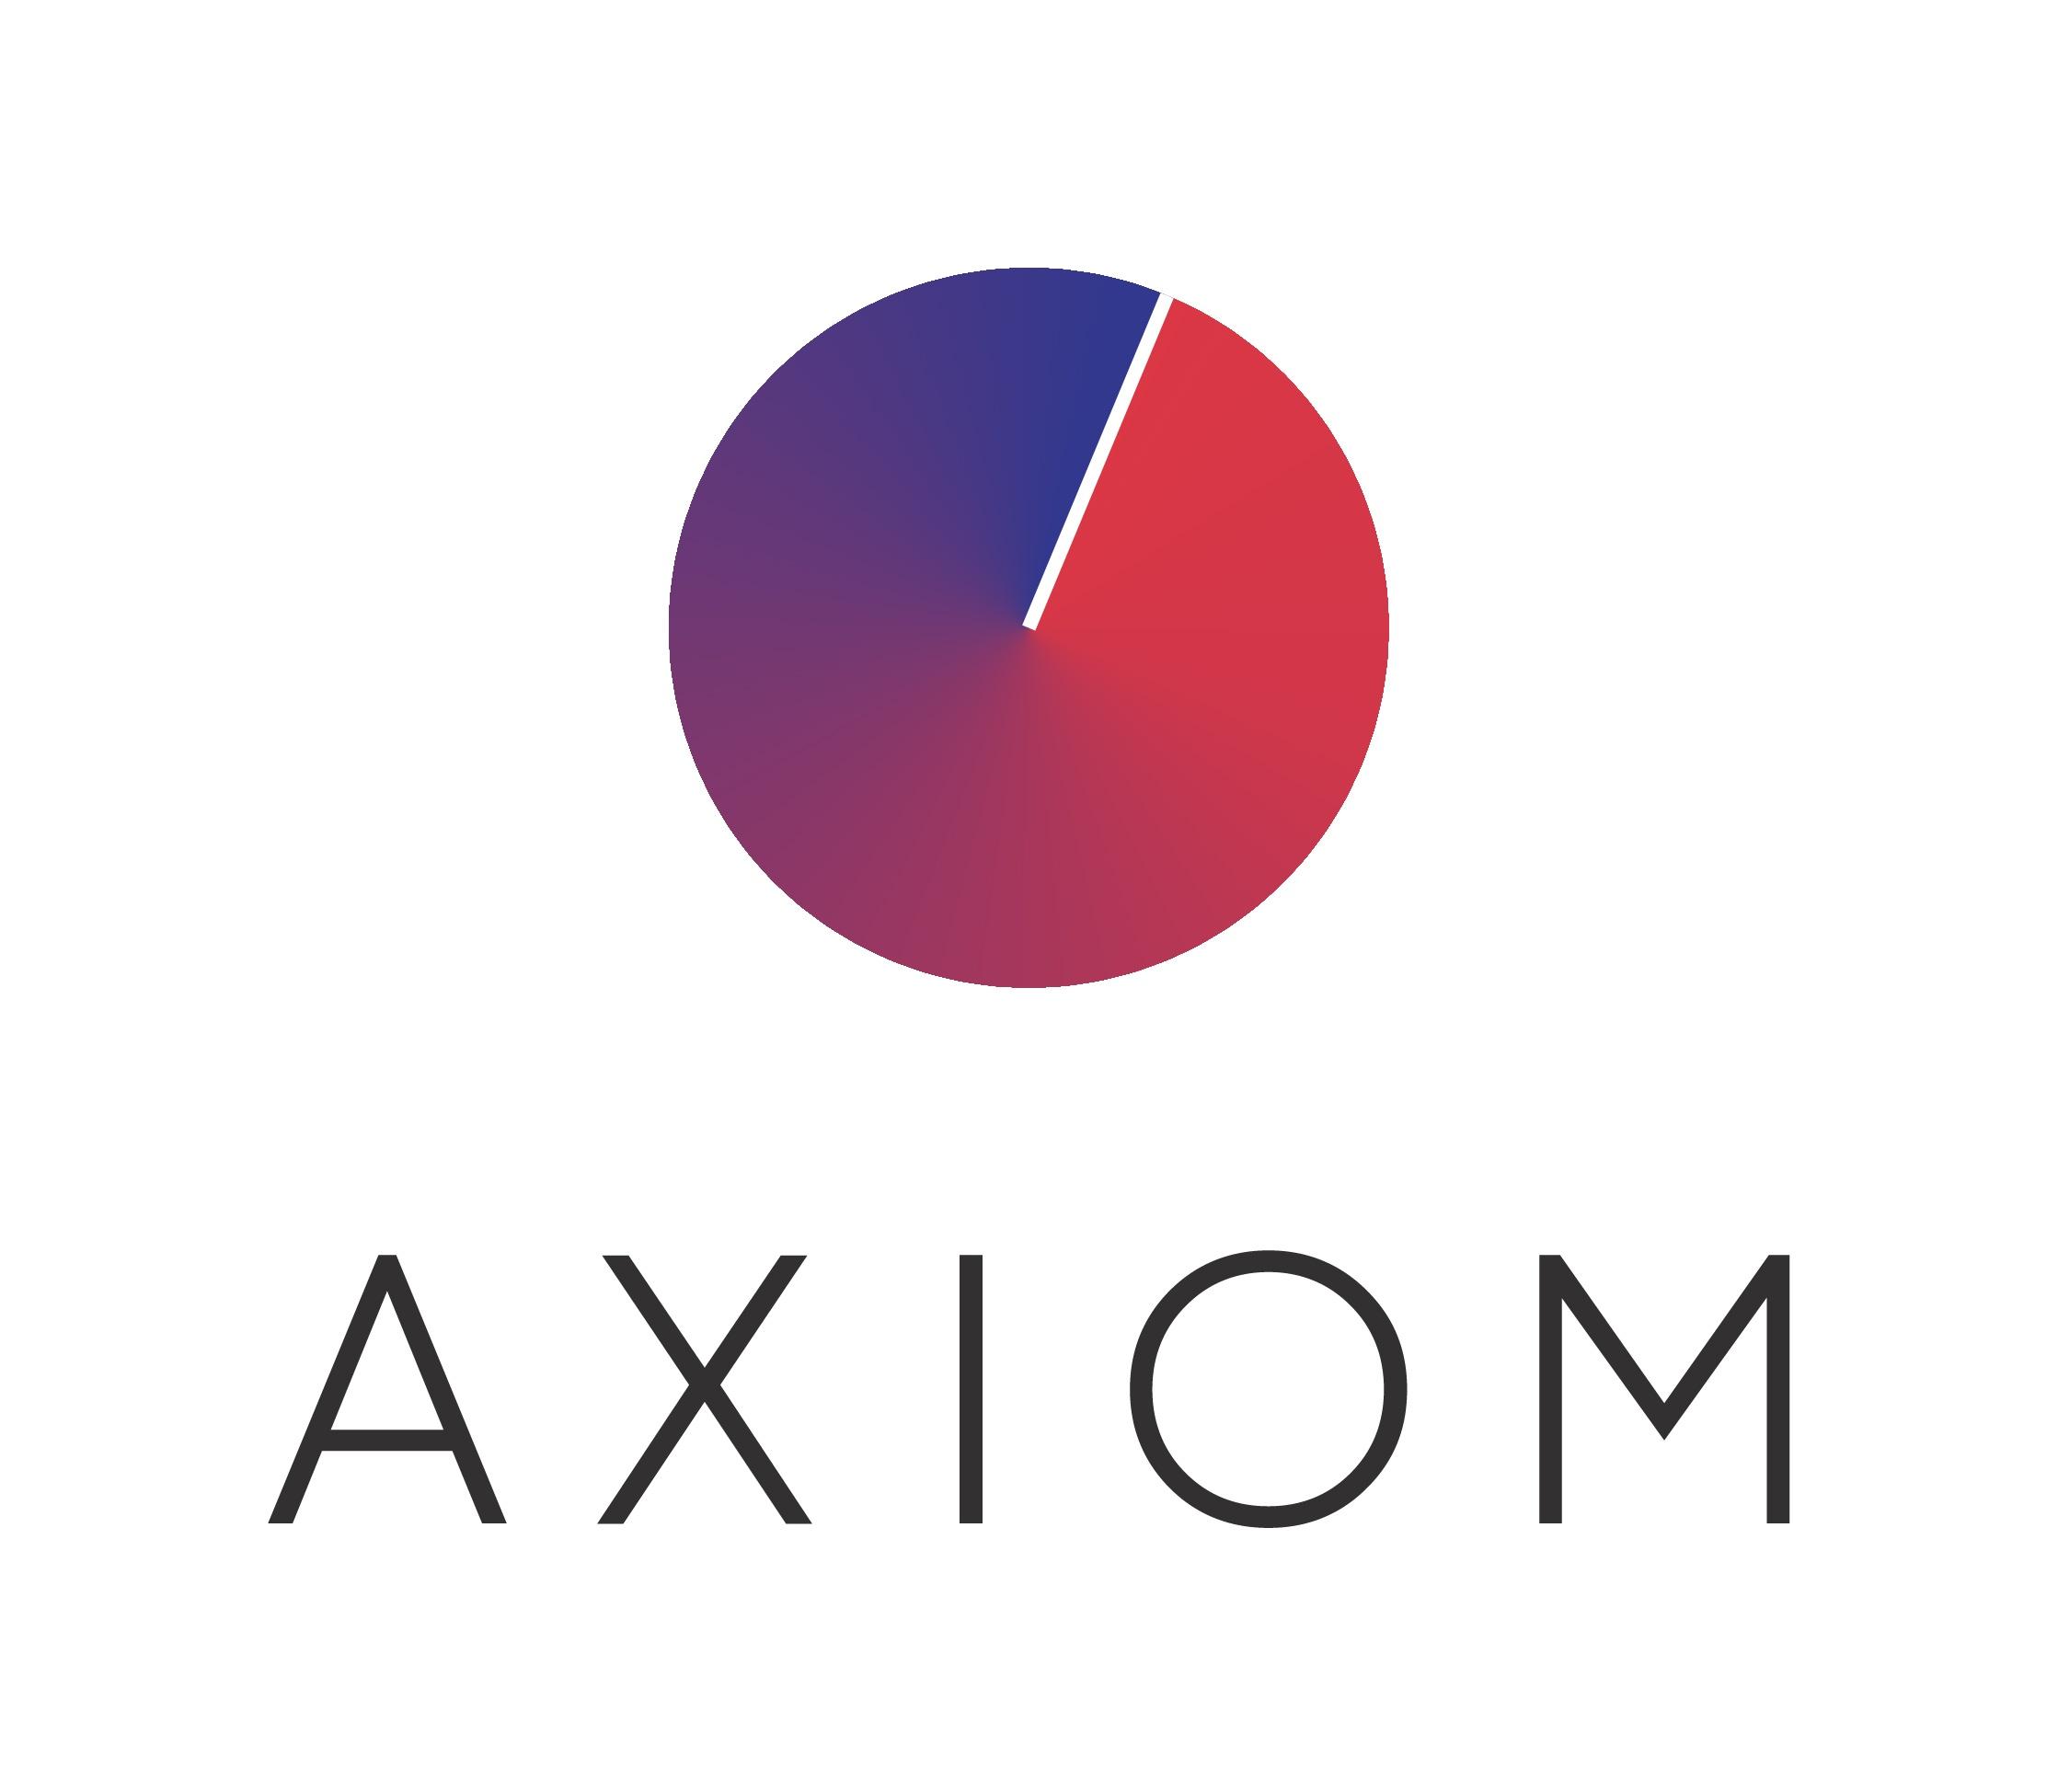 Axiom Workplaces